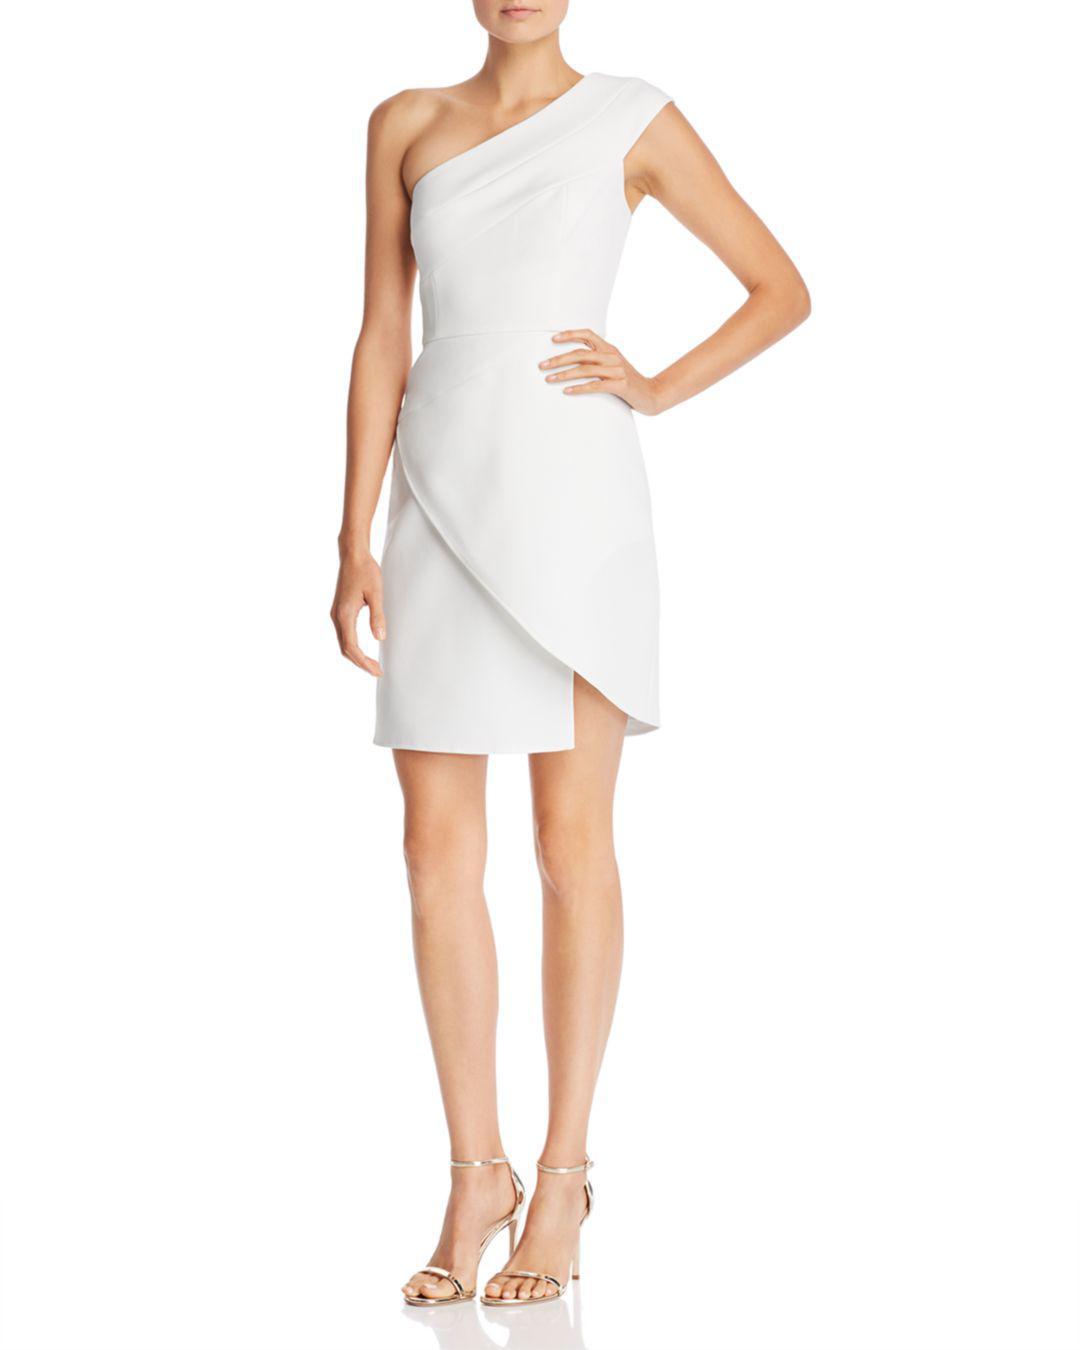 005df355bfd BCBGMAXAZRIA Aryanna One-shoulder Cocktail Dress in White - Lyst